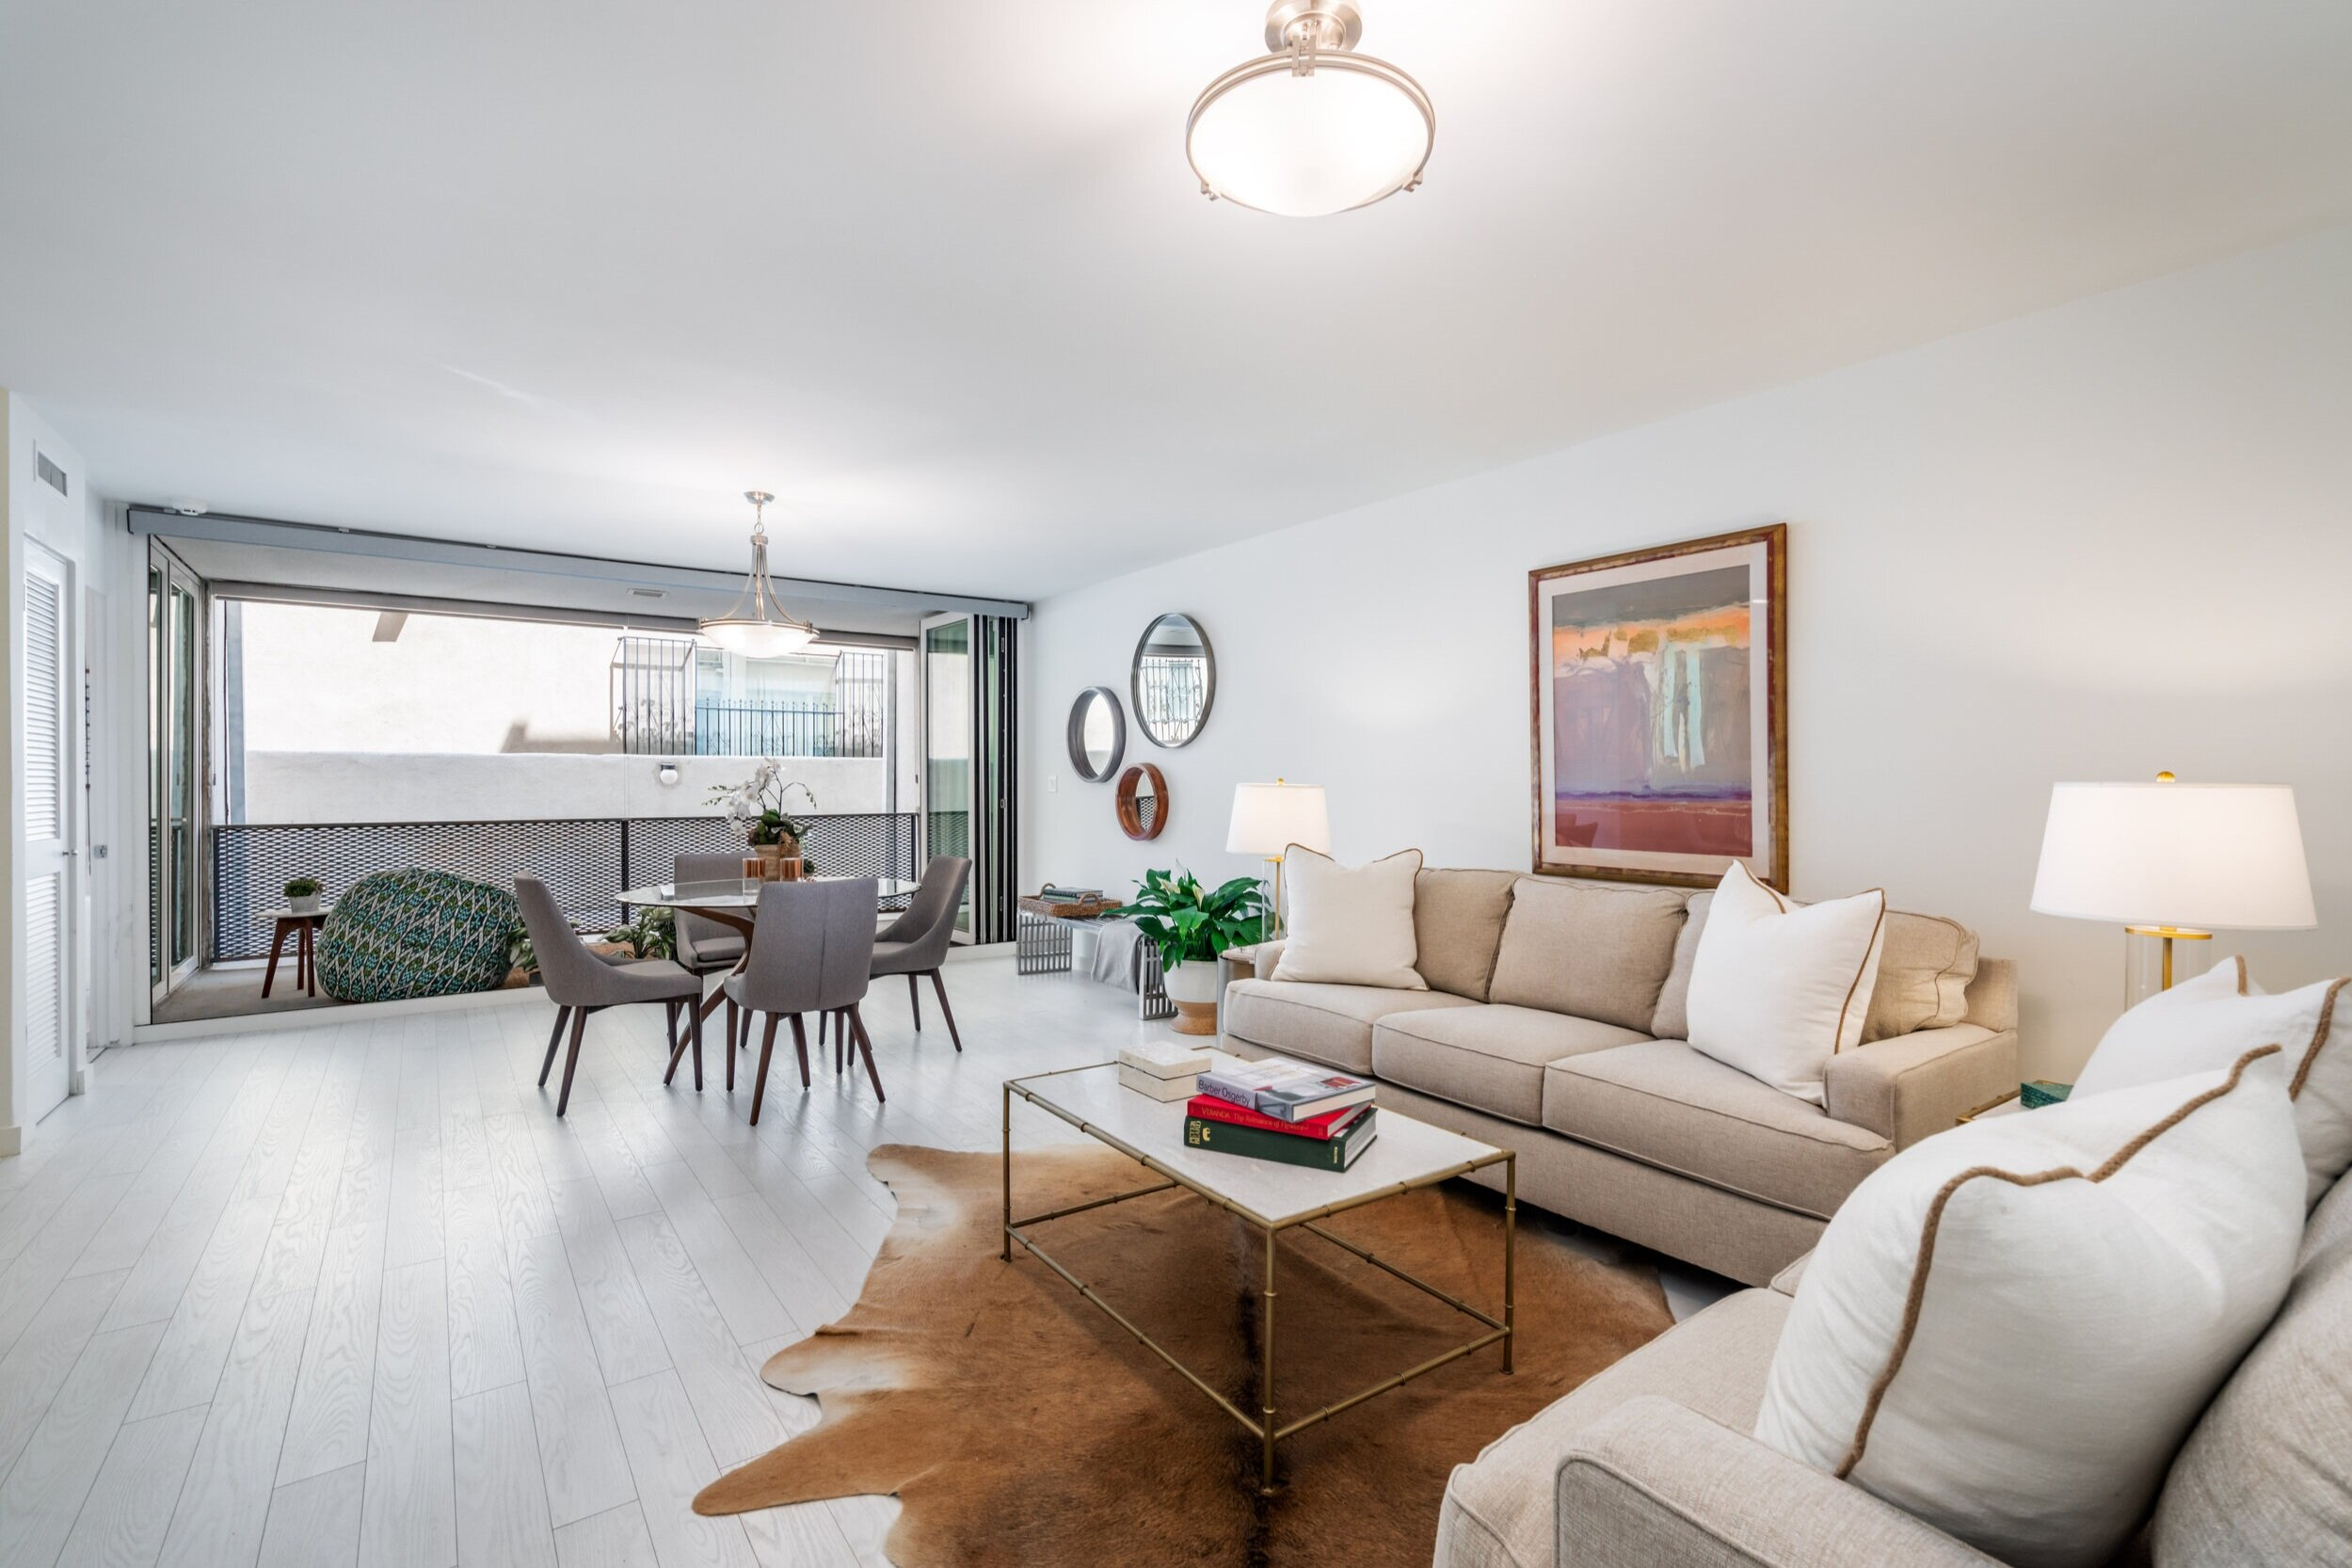 131 N. Gale Drive #1E - Beverly Hills, CA 90211$680,000   Beds: 1   Baths: 1   SqFt: 908